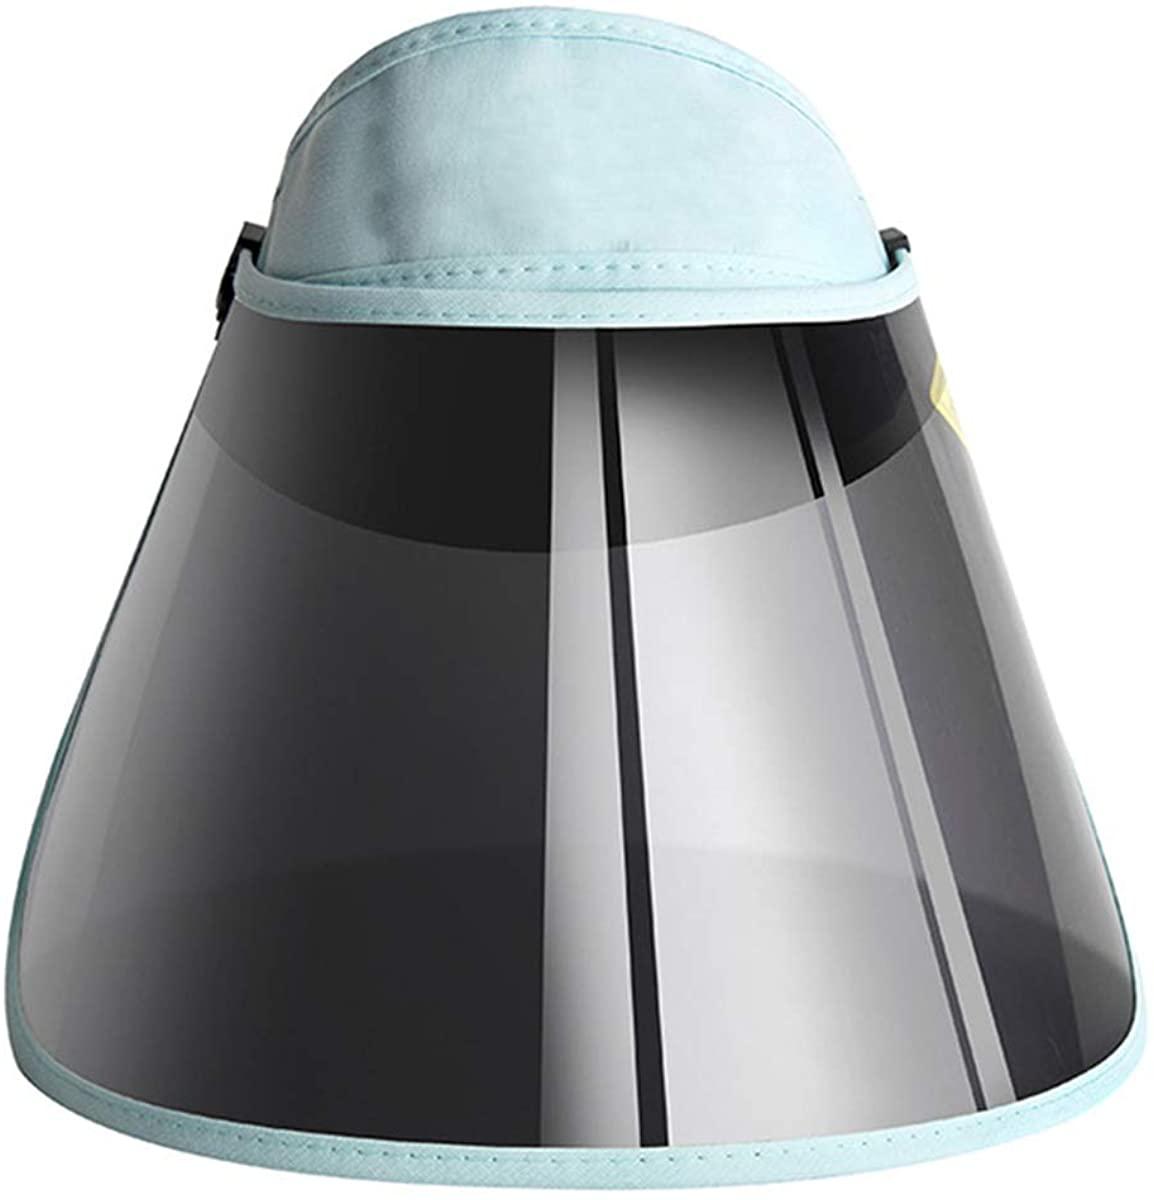 Portable Sun Visor Hat Adjustable UV Protection Hat Folding Headband Anti-UV Cap with Wide Brim for Camping Travel Golf